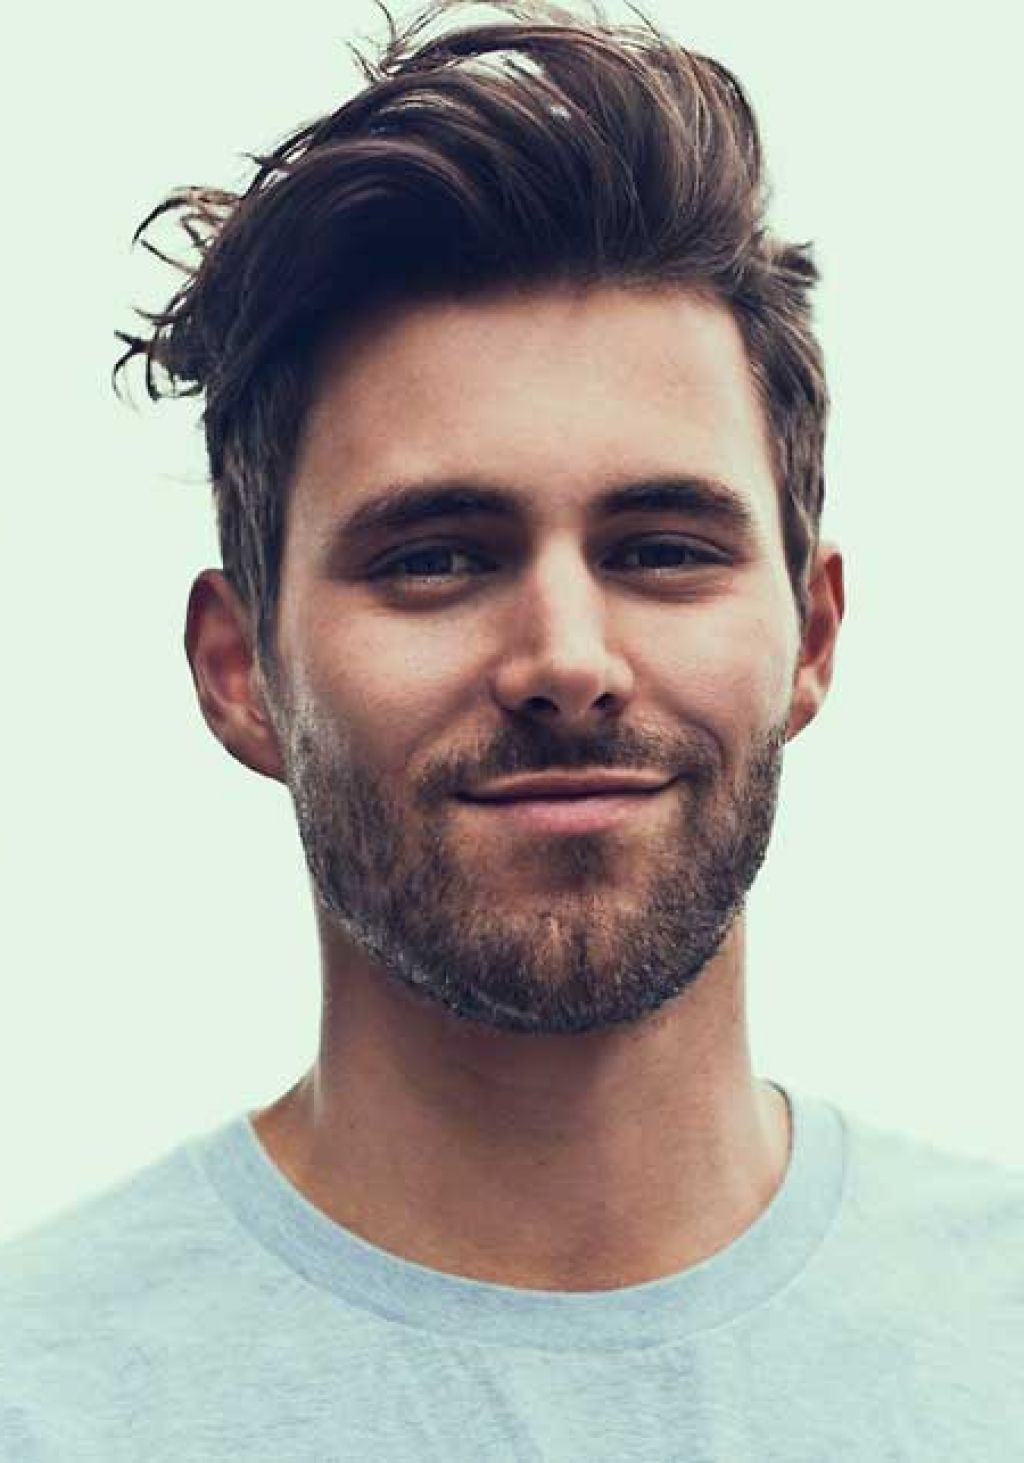 Medium haircuts for men  medium length hairstyles for men  hairstyle  pinterest  hair